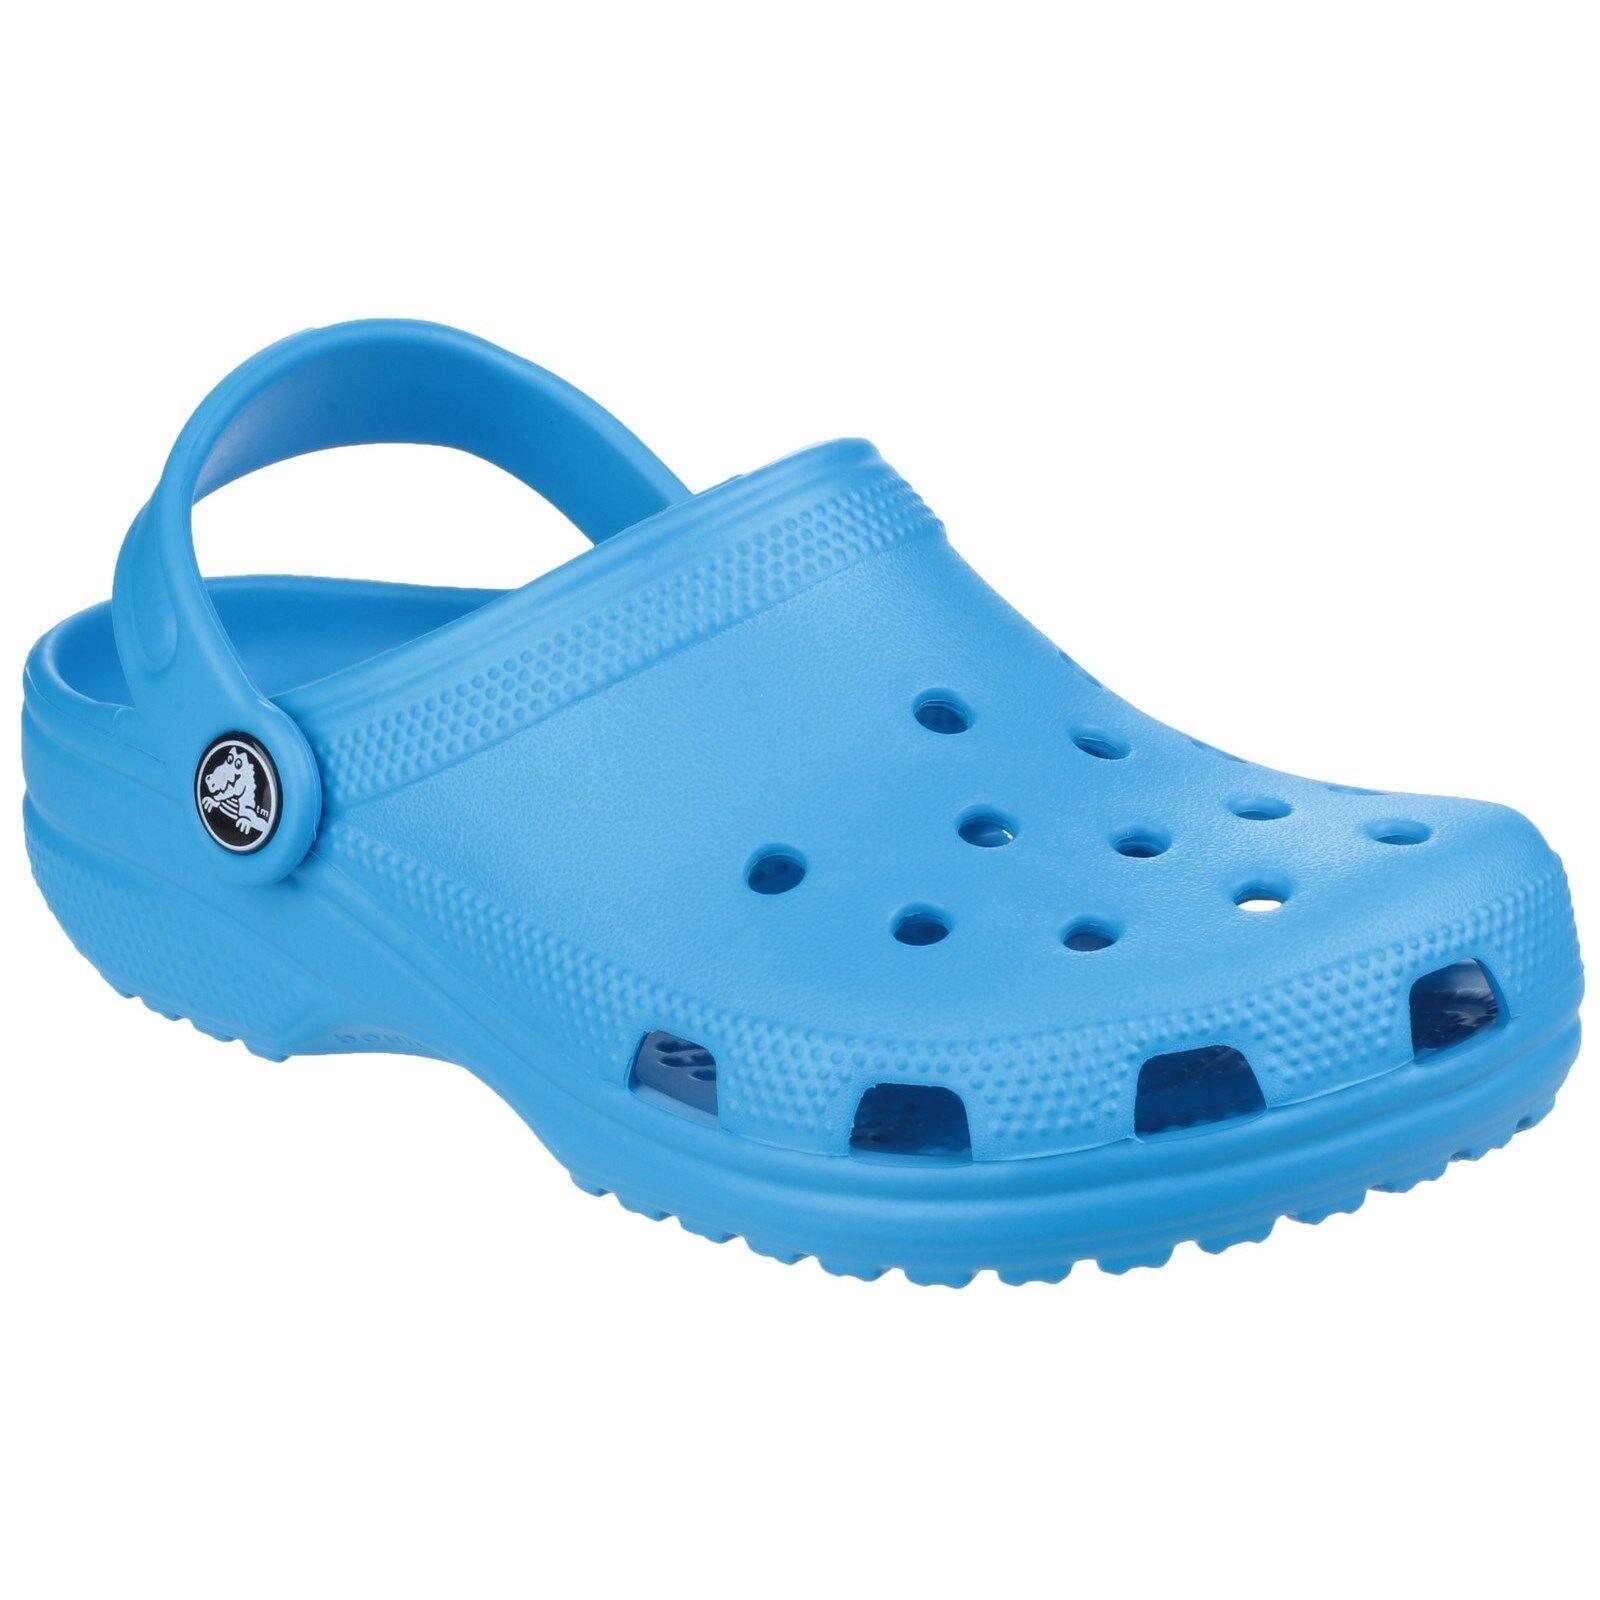 12f51af231e24 Crocs Classic Clogs Childrens Croslite Lightweight Kids Boys Girls Shoes  Sandals